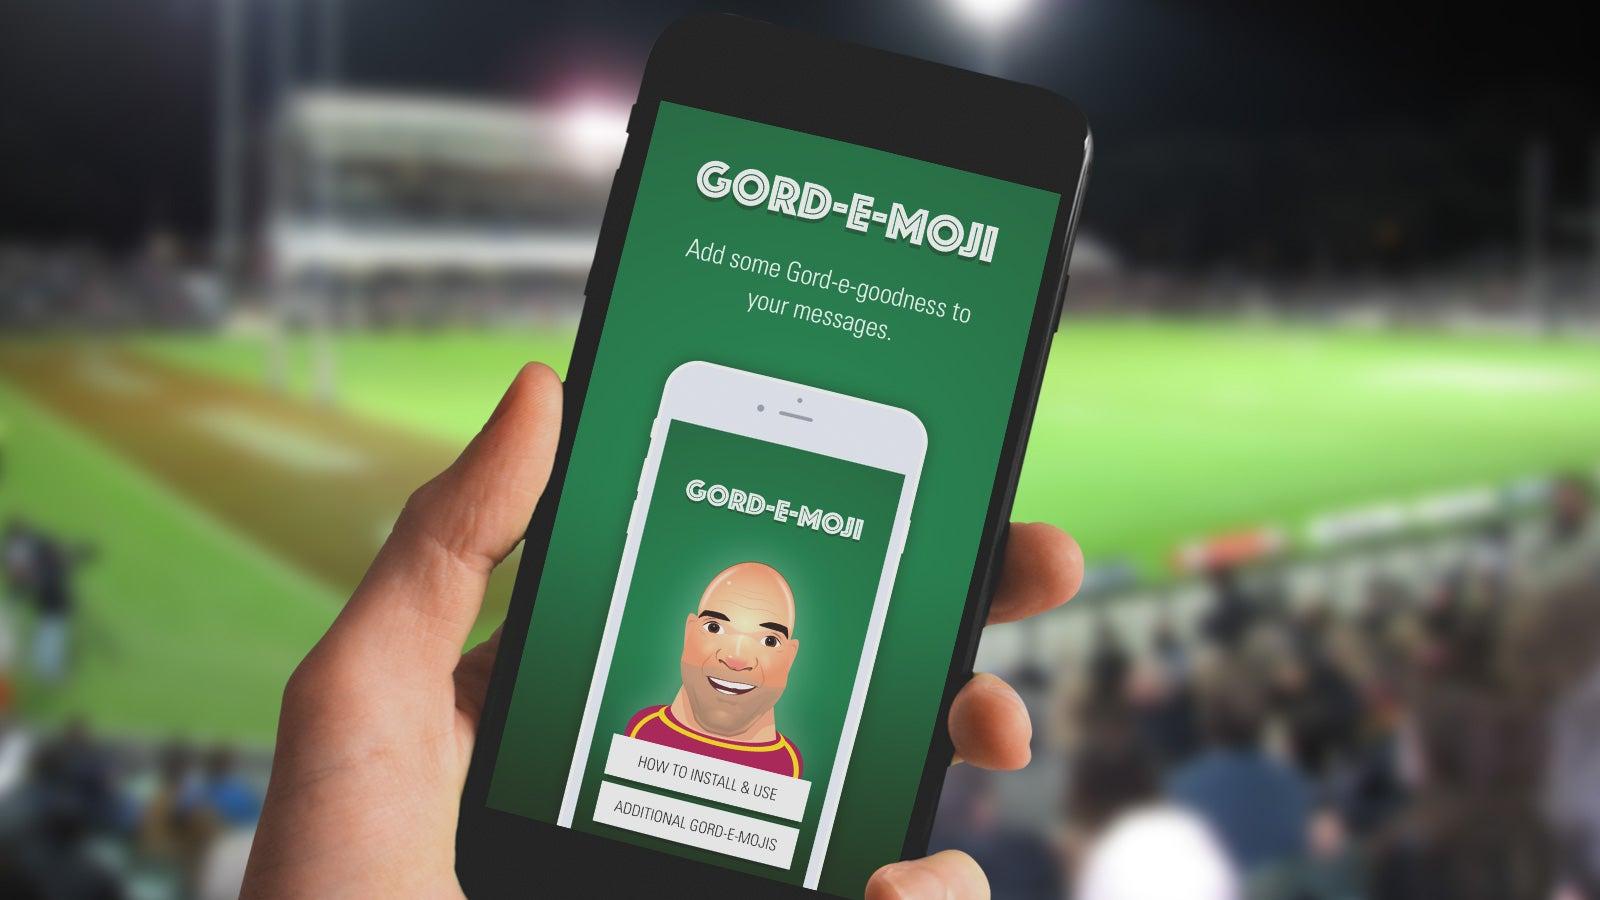 Gord-e-moji | Gorden Tallis Rugby League emojis app on mobile | Devotion